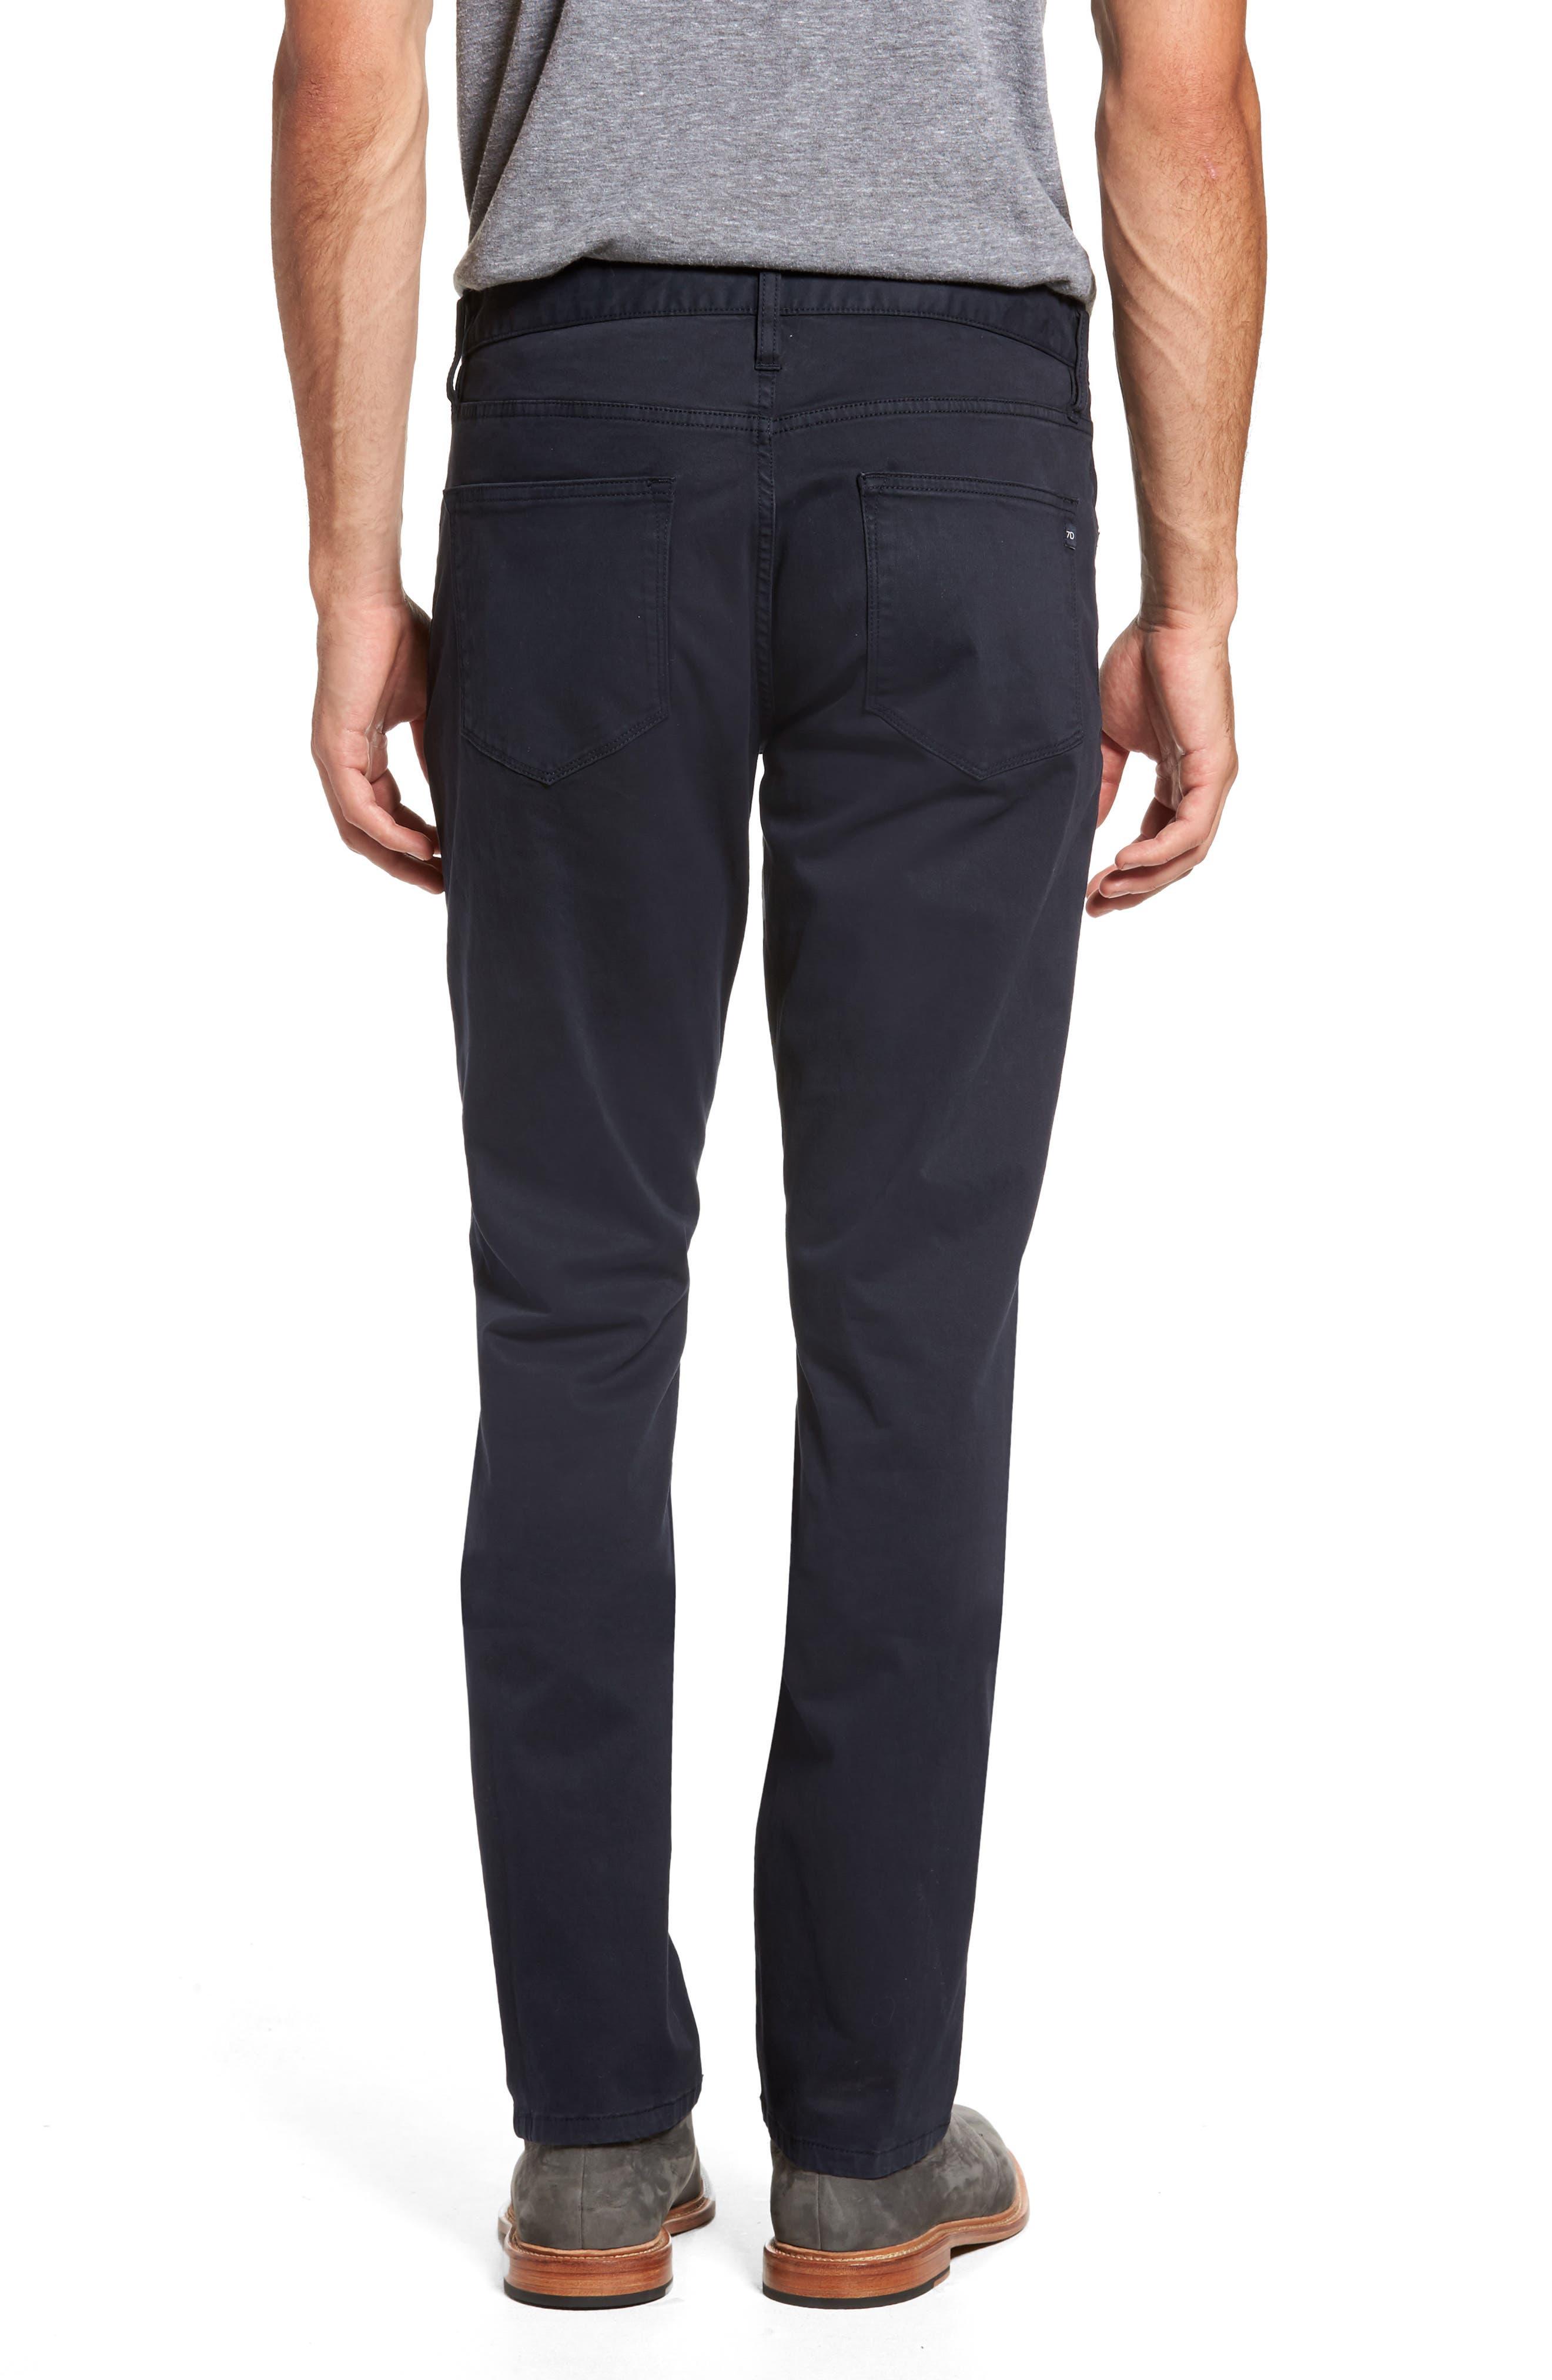 Brushed Twill Five-Pocket Pants,                             Alternate thumbnail 2, color,                             Navy